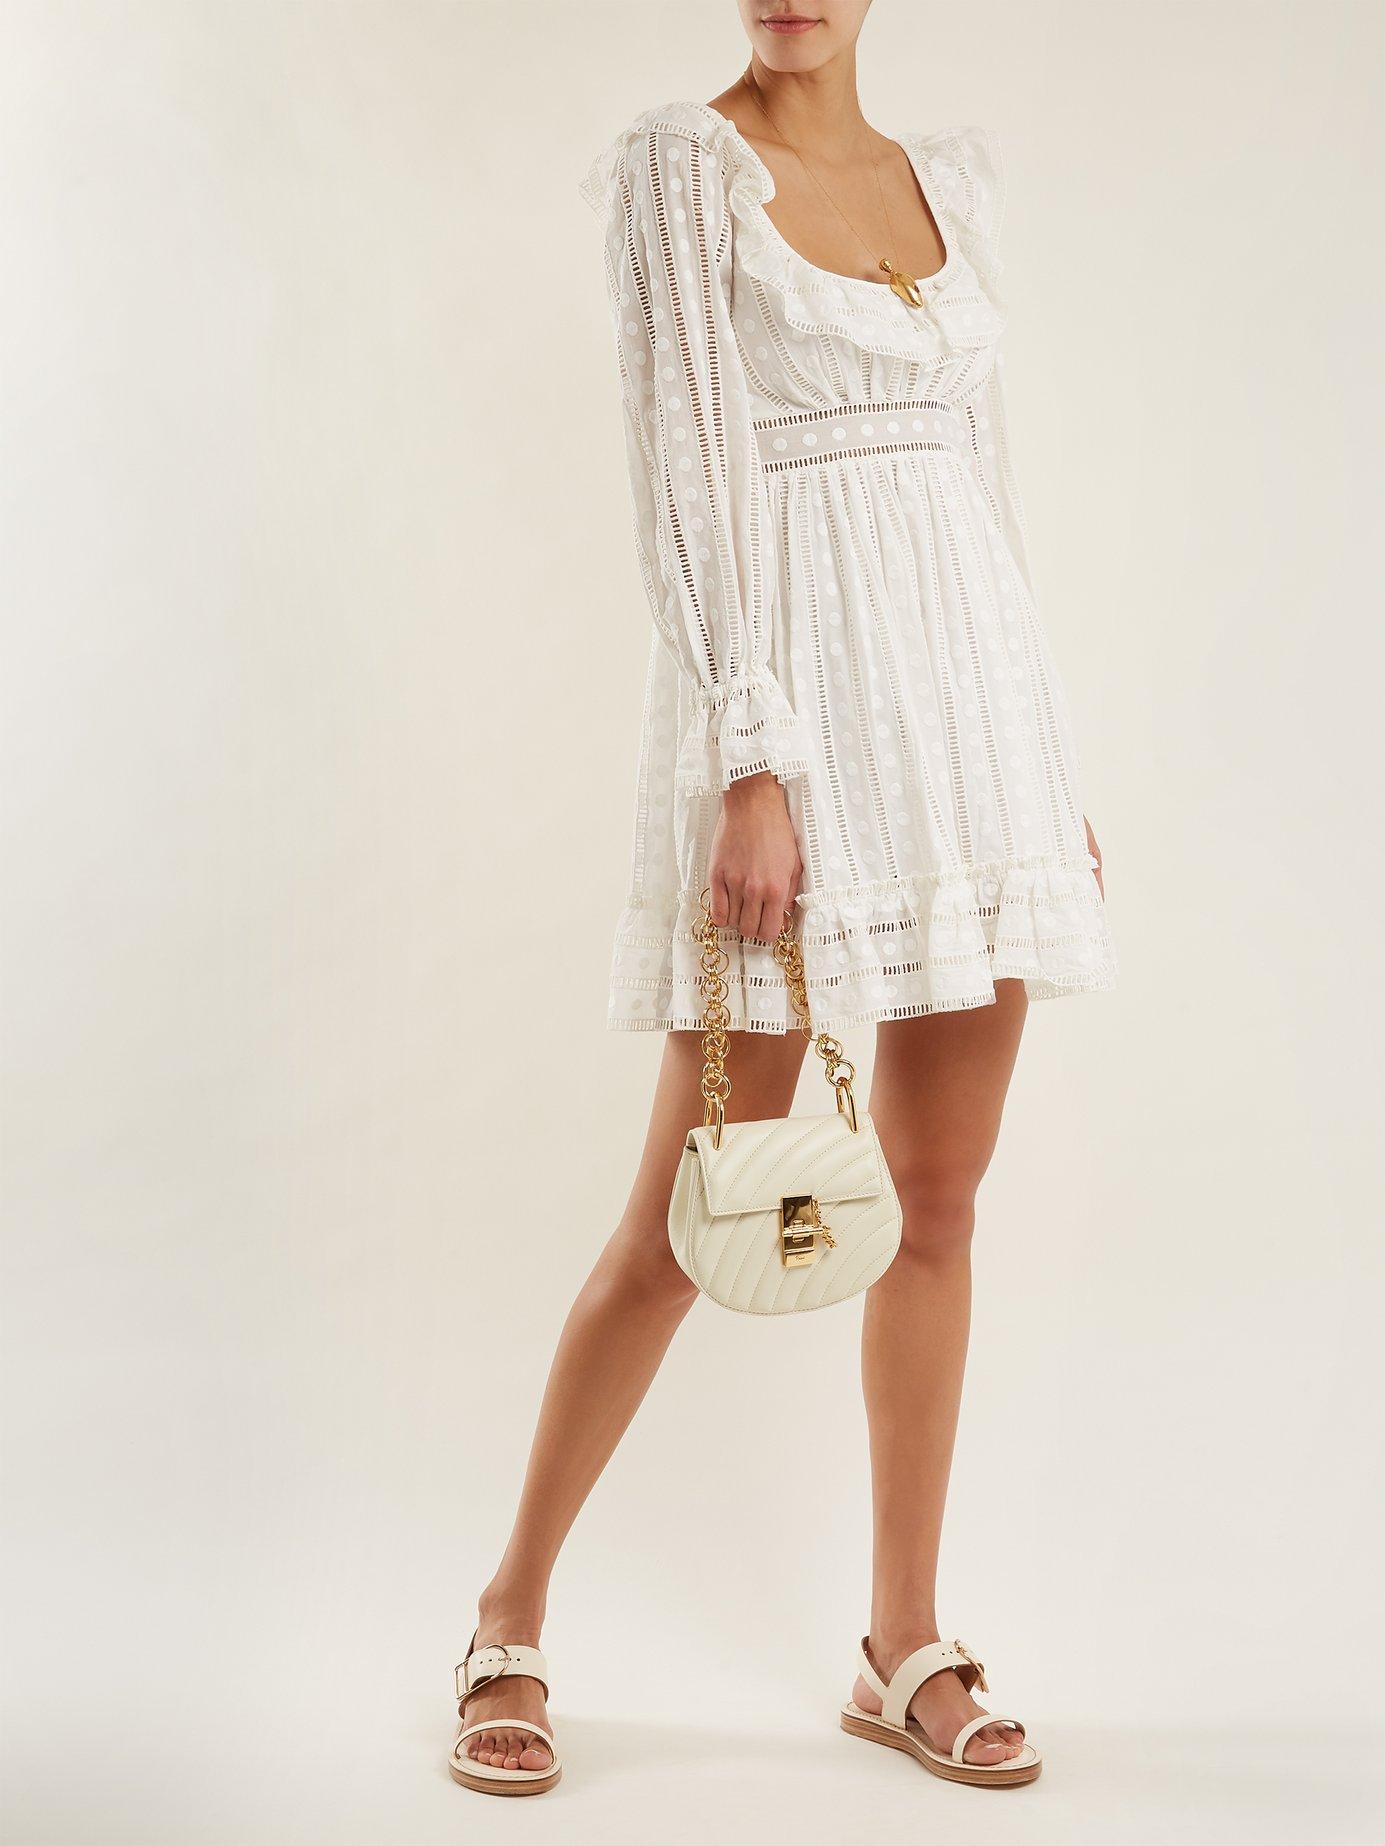 Melody ladder-lace dress by Zimmermann